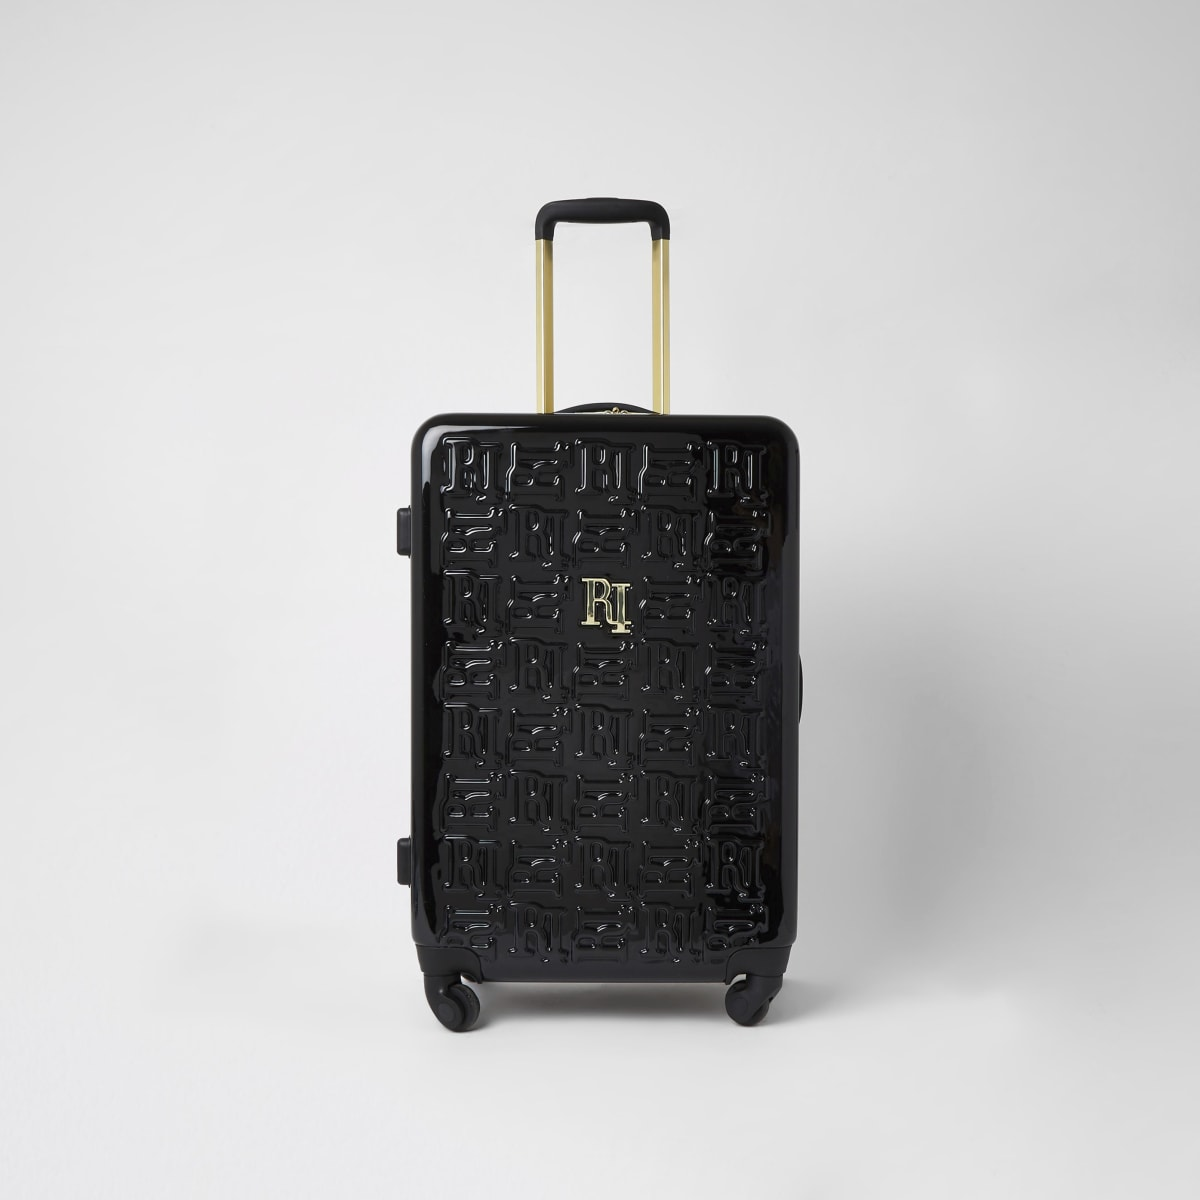 Zwarte medium koffer met RI-reliëf